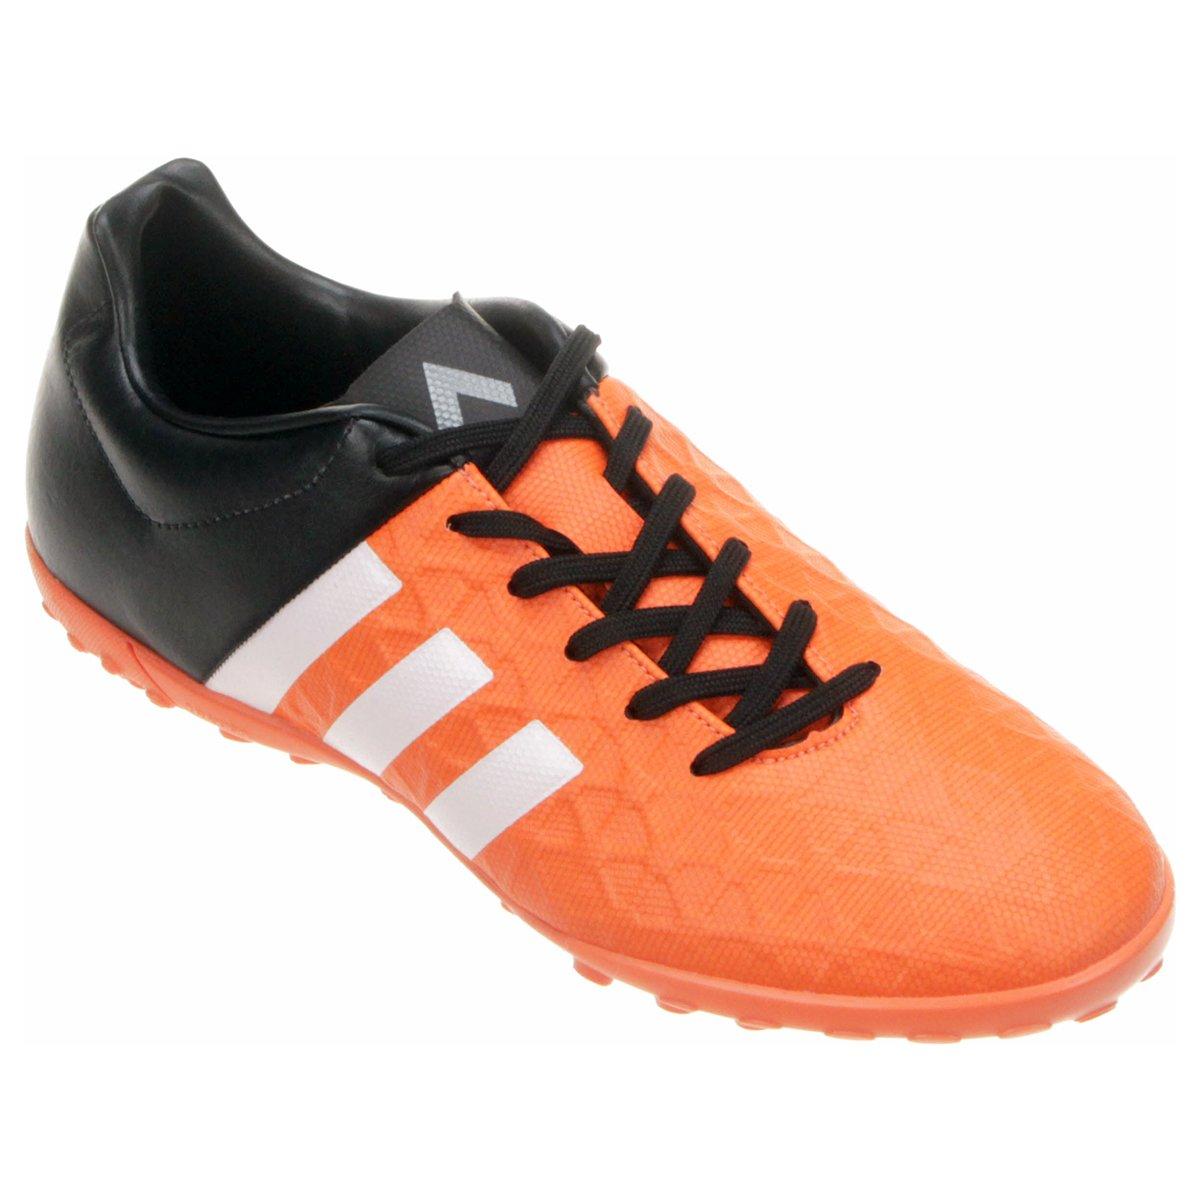 f3fb627d71 Chuteira Society Adidas Ace 15 4 TF Masculina - Compre Agora